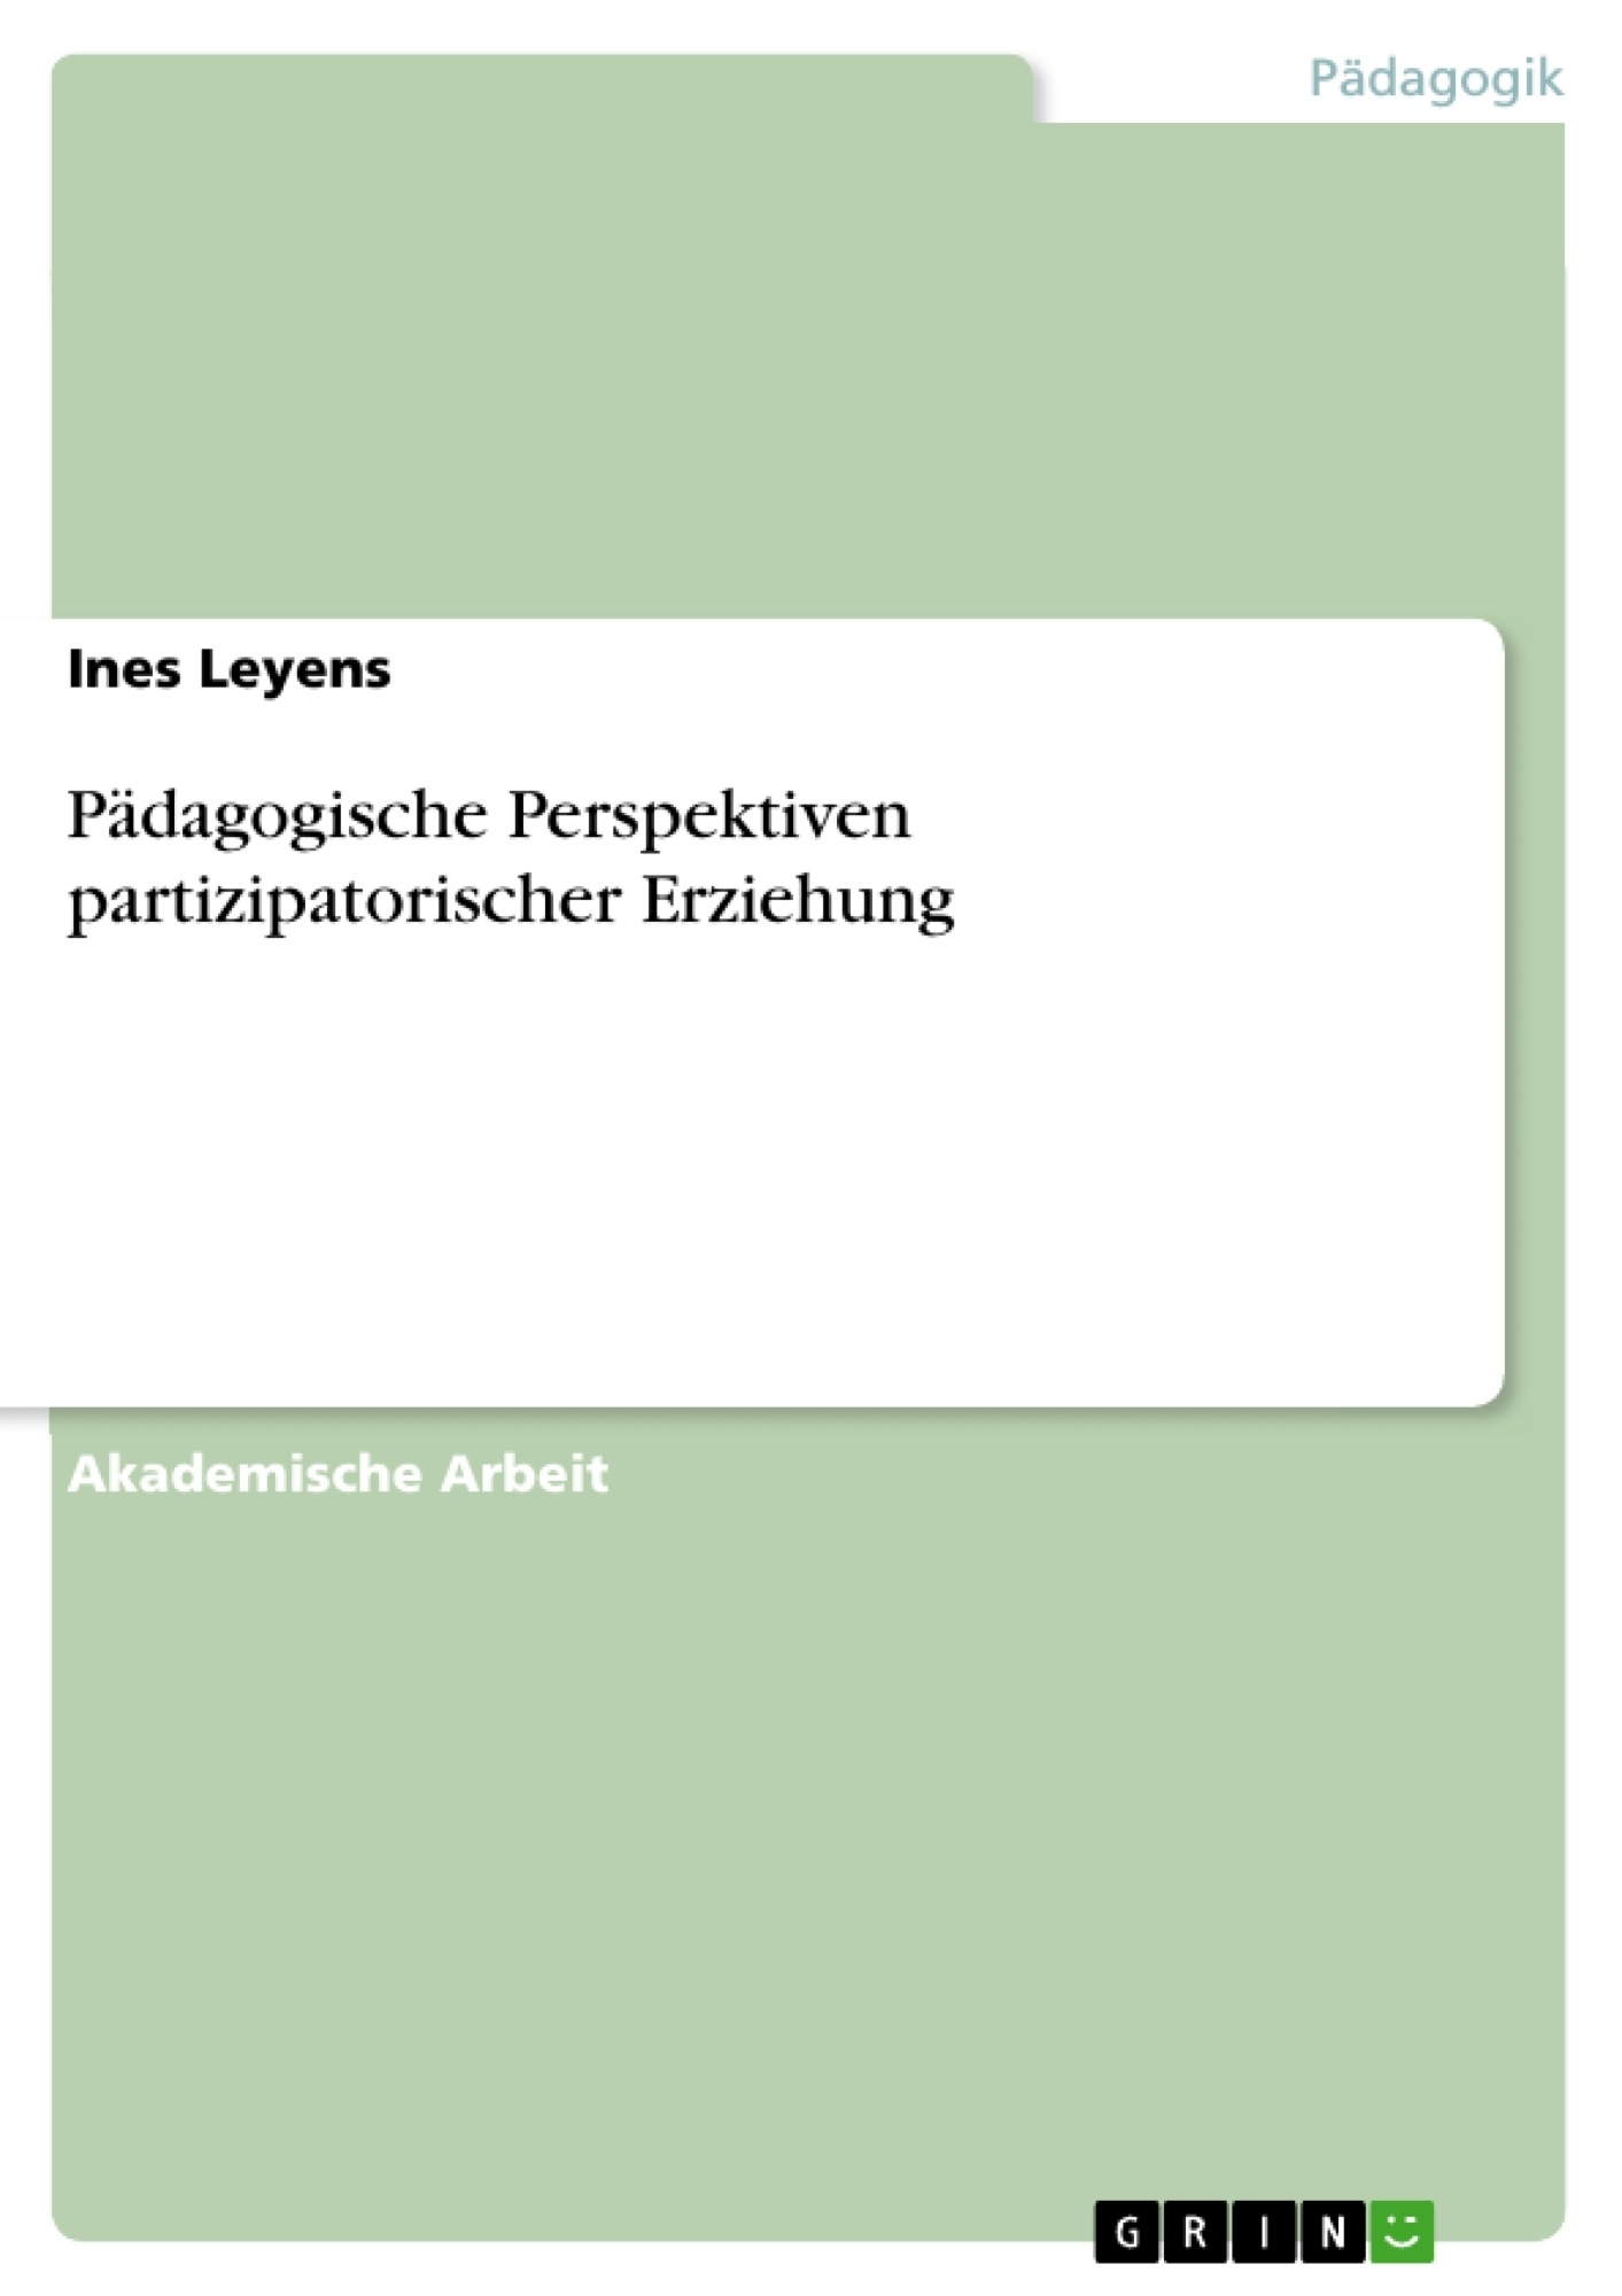 Titel: Pädagogische Perspektiven partizipatorischer Erziehung